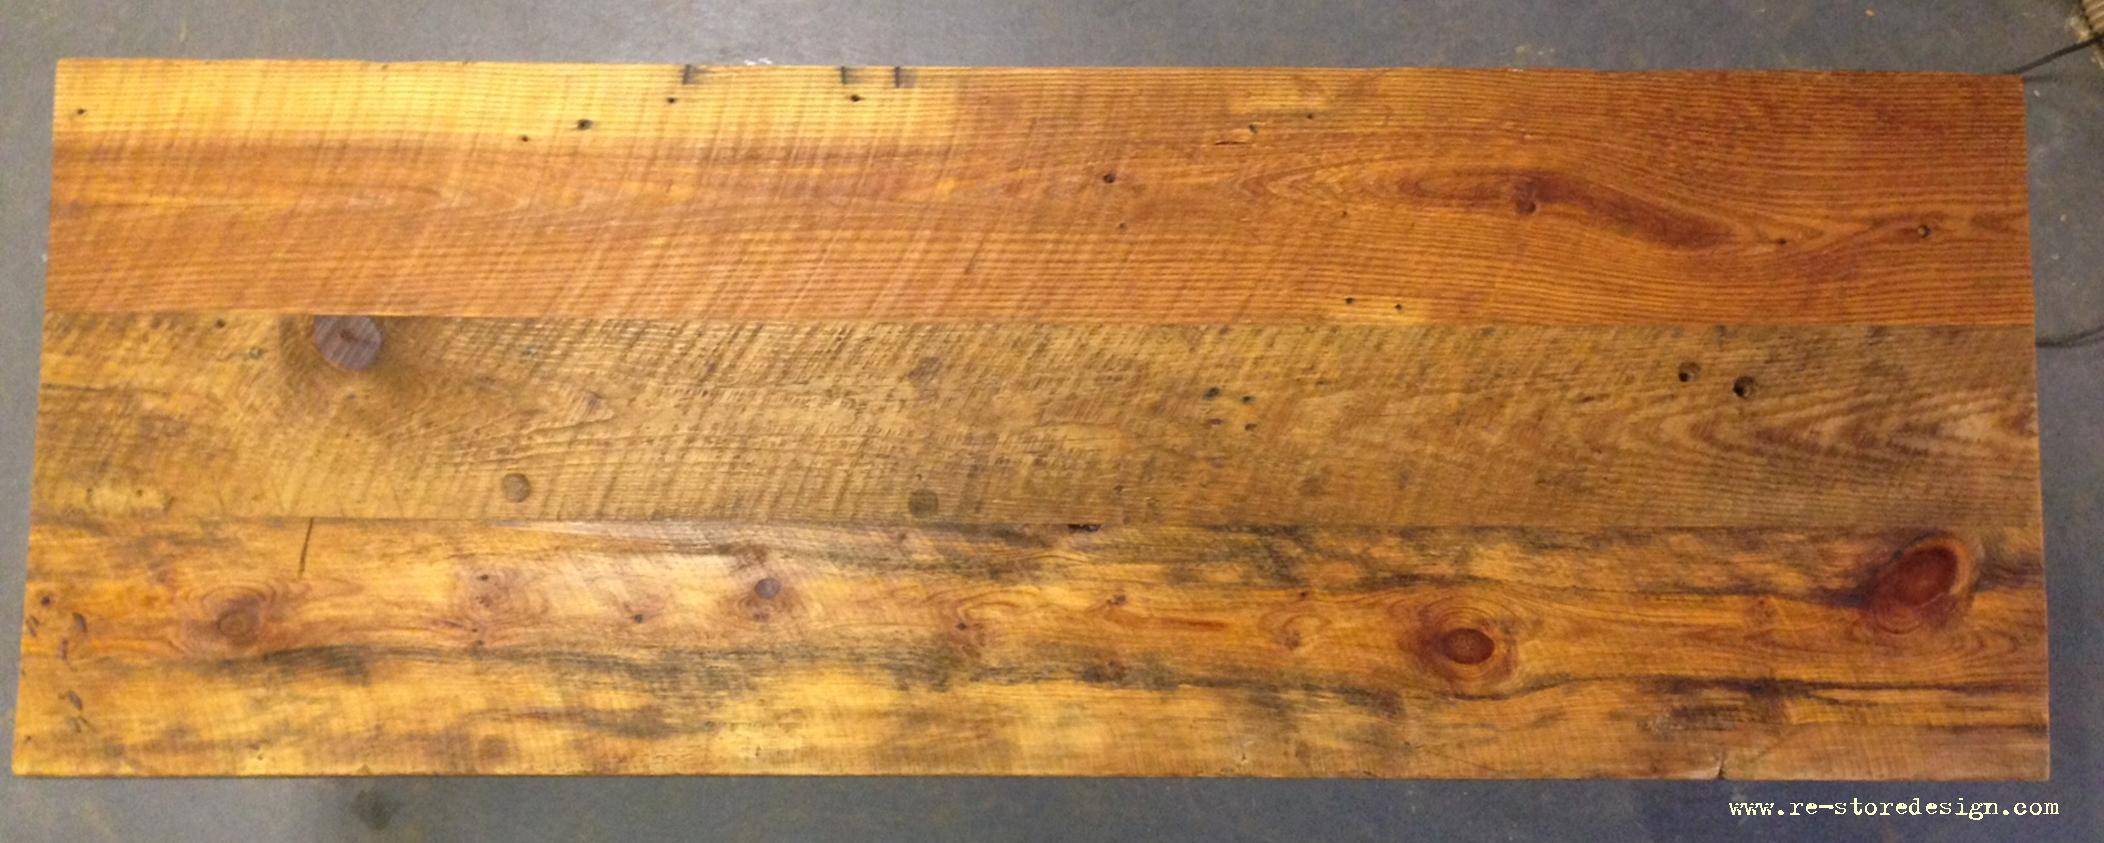 Reclaimed wood table top - Condo Size Reclaimed Wood Farm Table 2